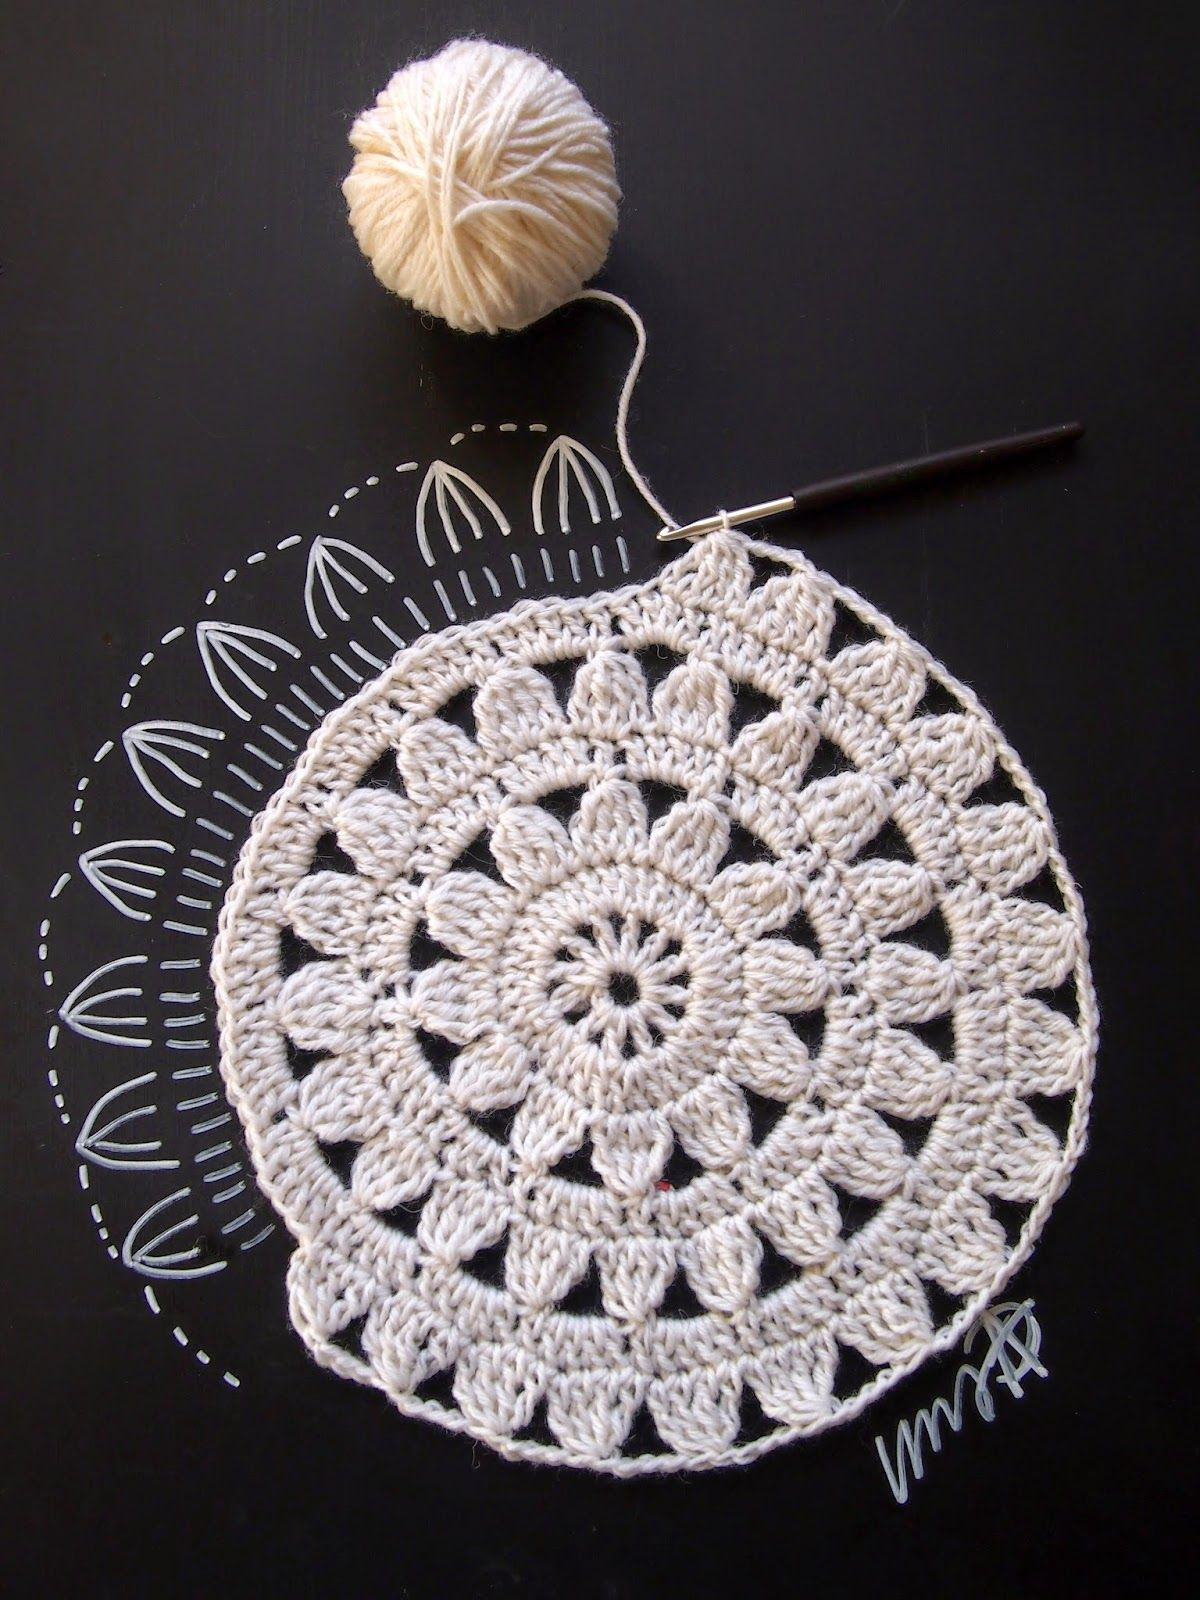 Pin Von Luciana Marques Jj Auf Bolsa De Crochê Pinterest Häkeln